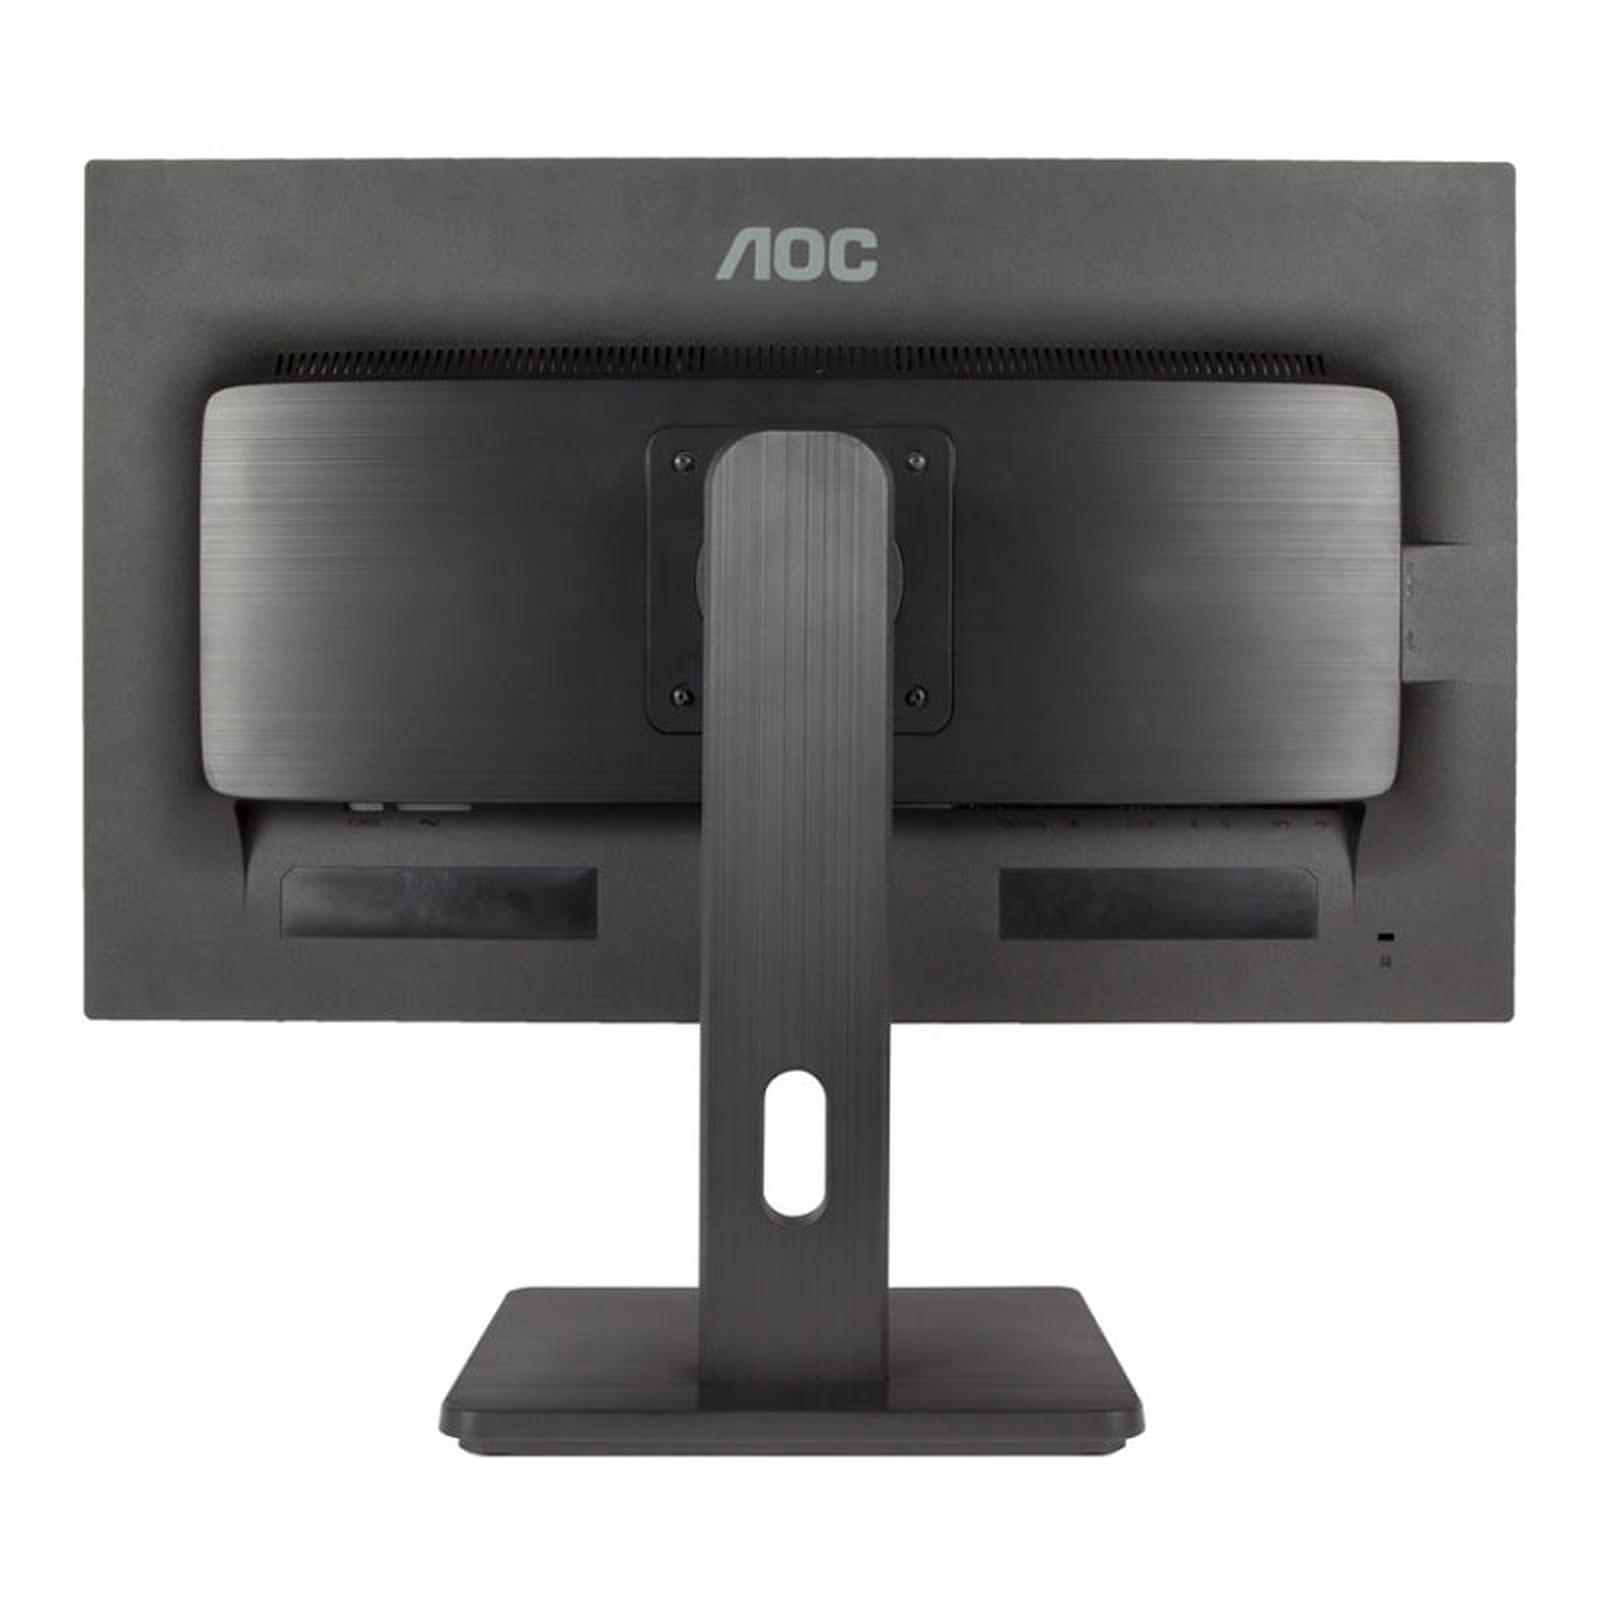 Ecran Moniteur LED 24 pouces AOC e2475Pwj 16/9eme (2ms) VGA/DVI/HDMI,Informatique Réunion 974